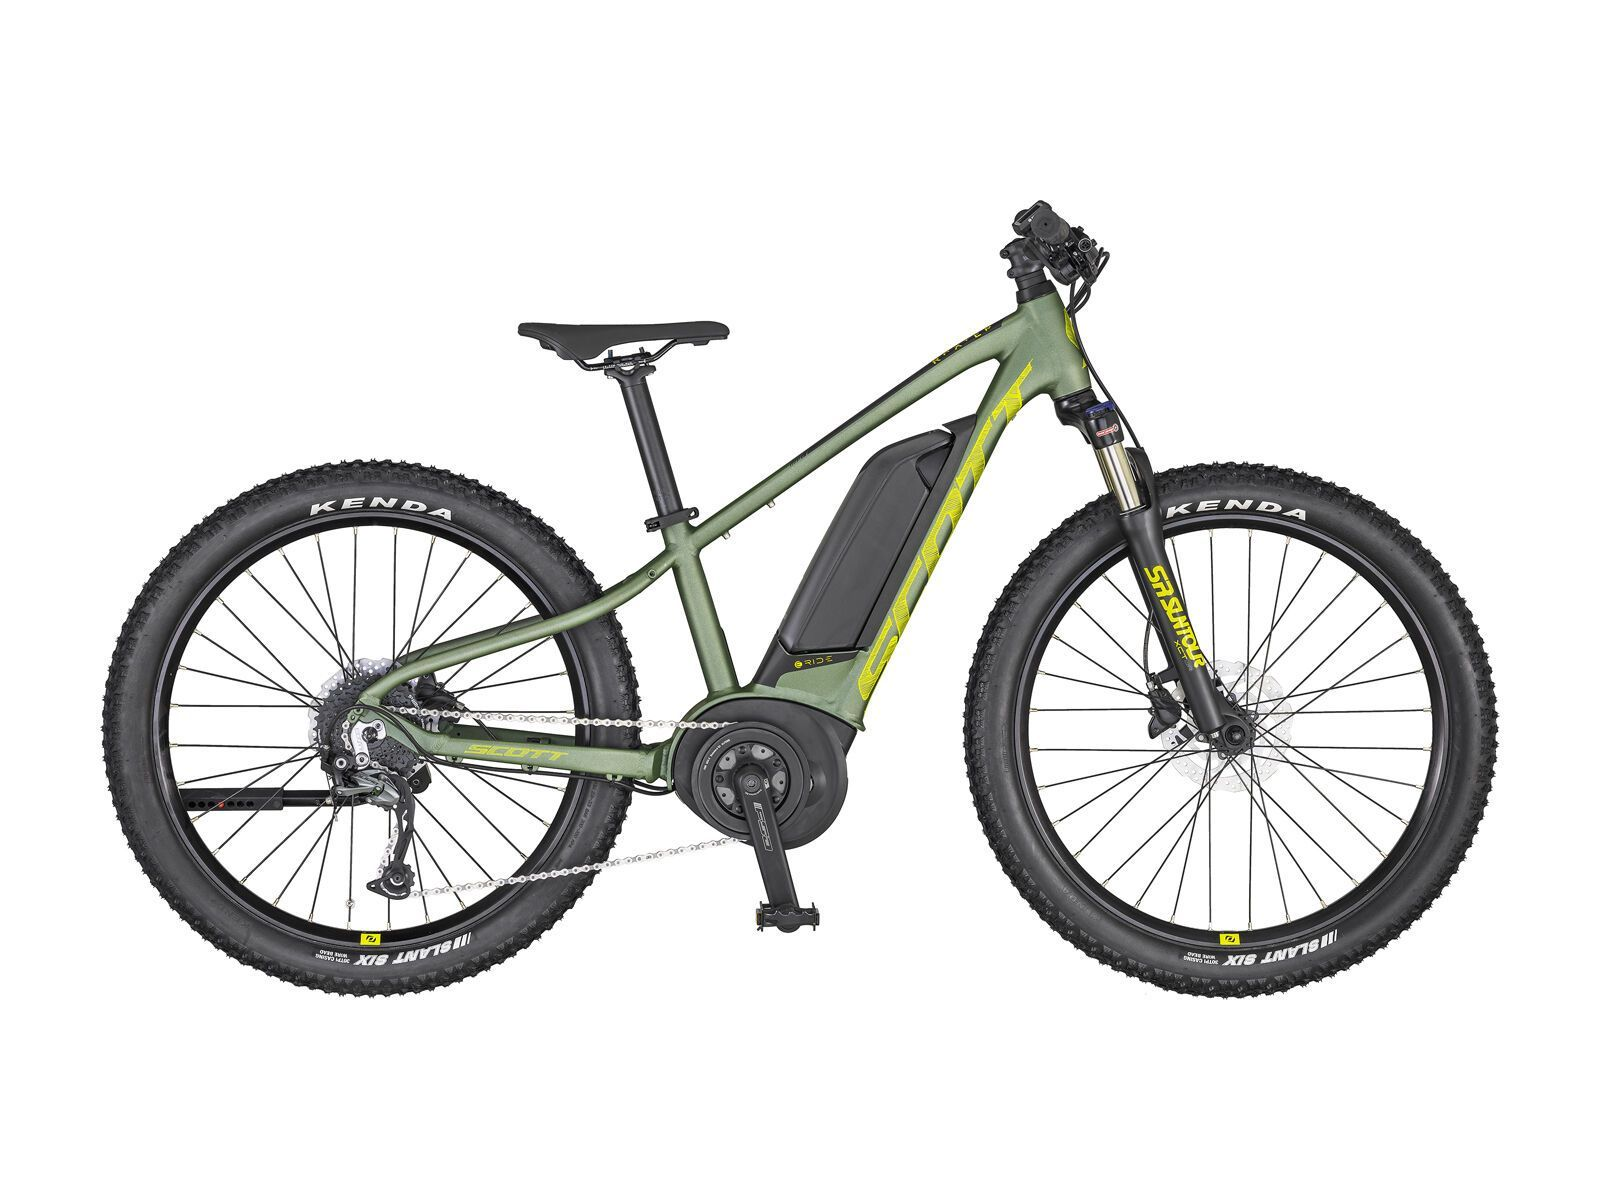 Scott Roxter eRide 24, dark ivy green/radium yellow/black   Bild 1